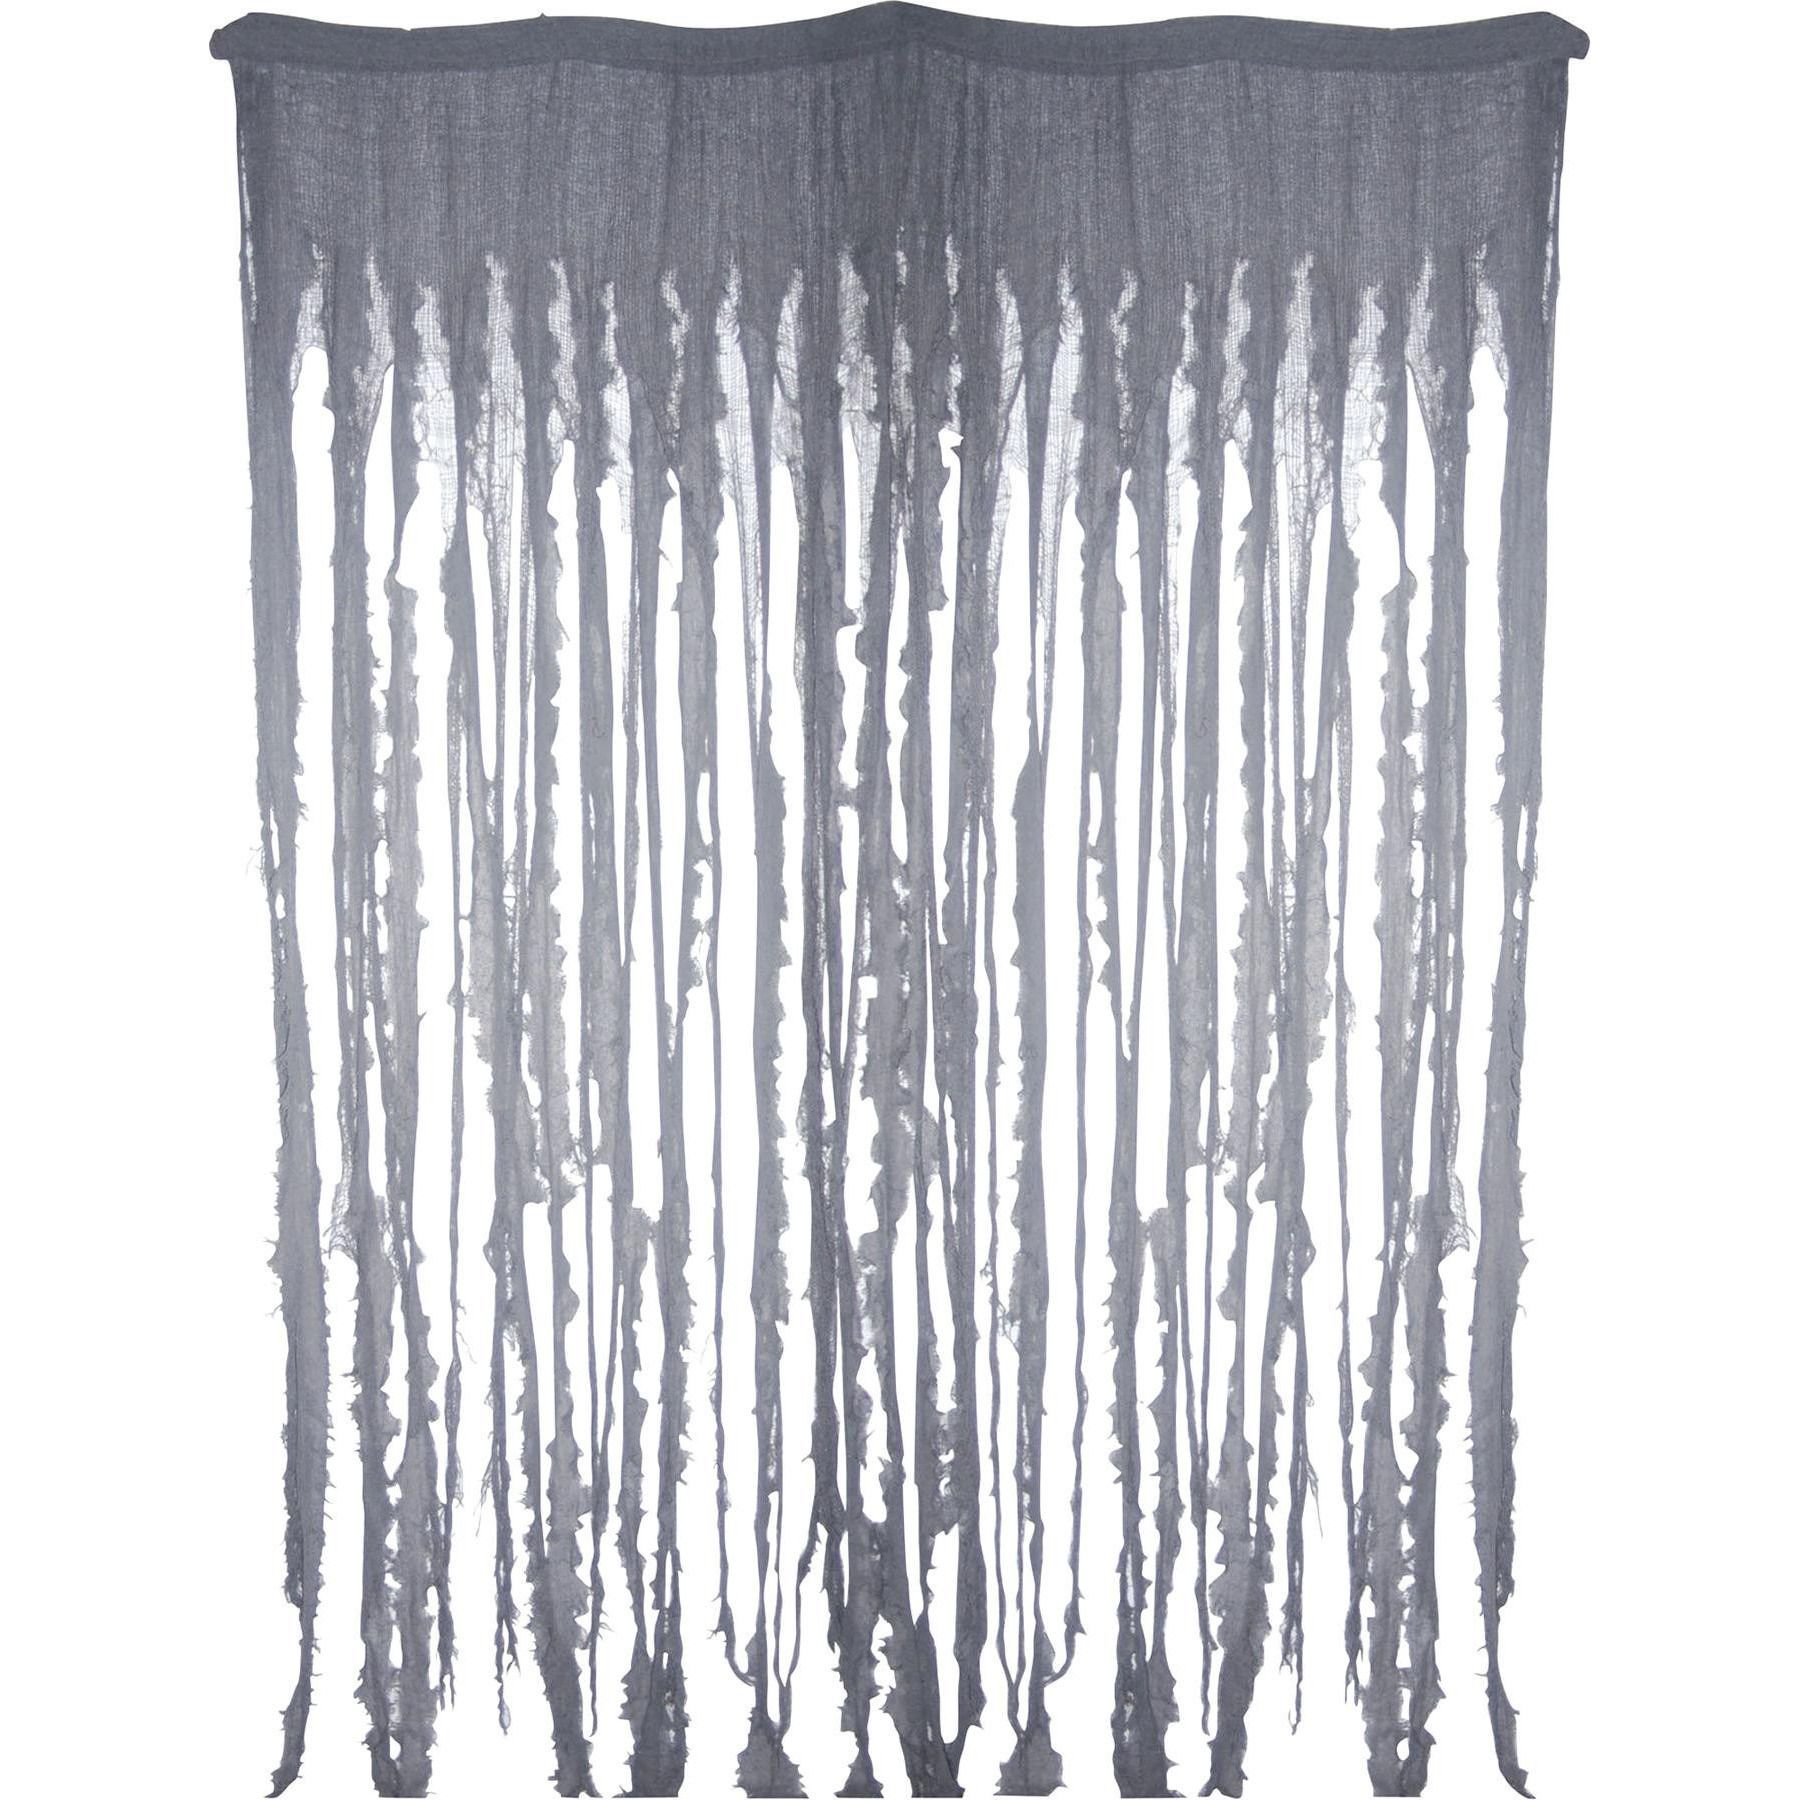 Curtain creepy cloth creepy and products